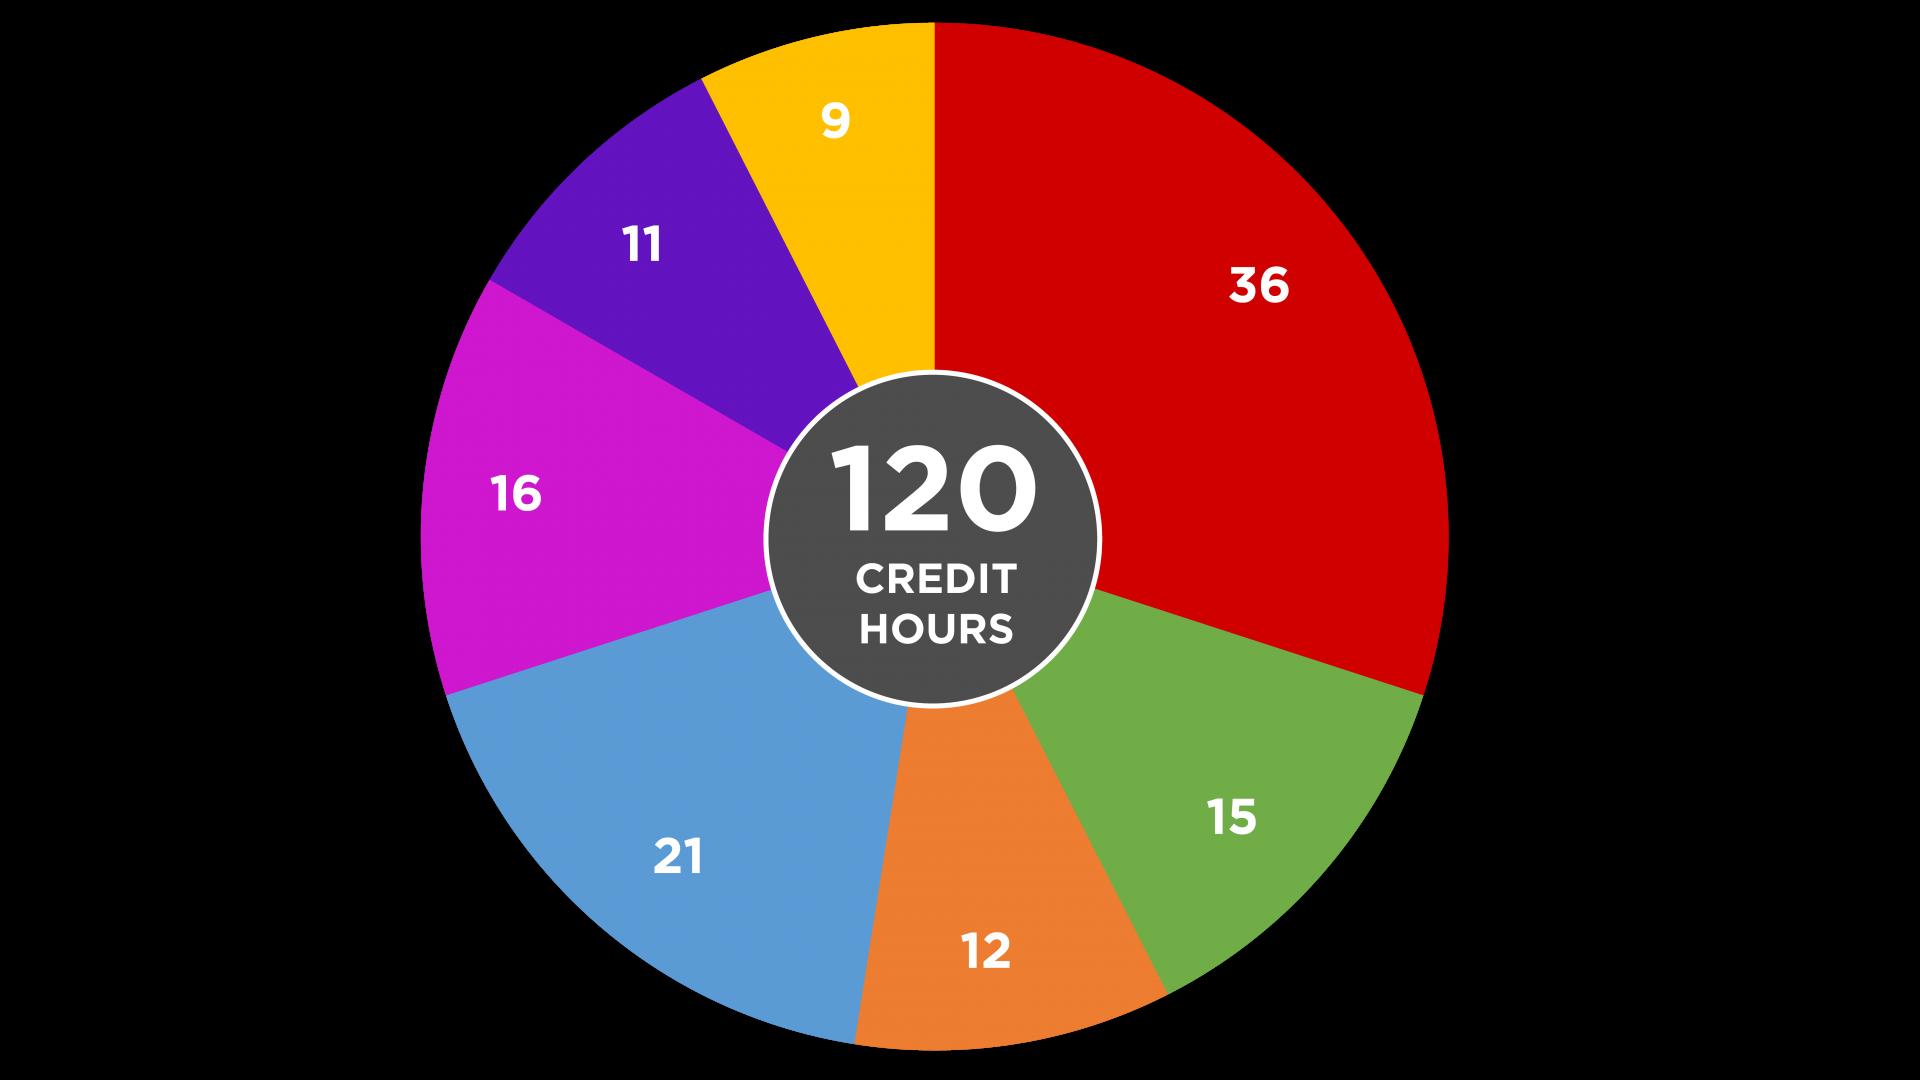 Computer Science Credit Hours Per Major Circle Graph